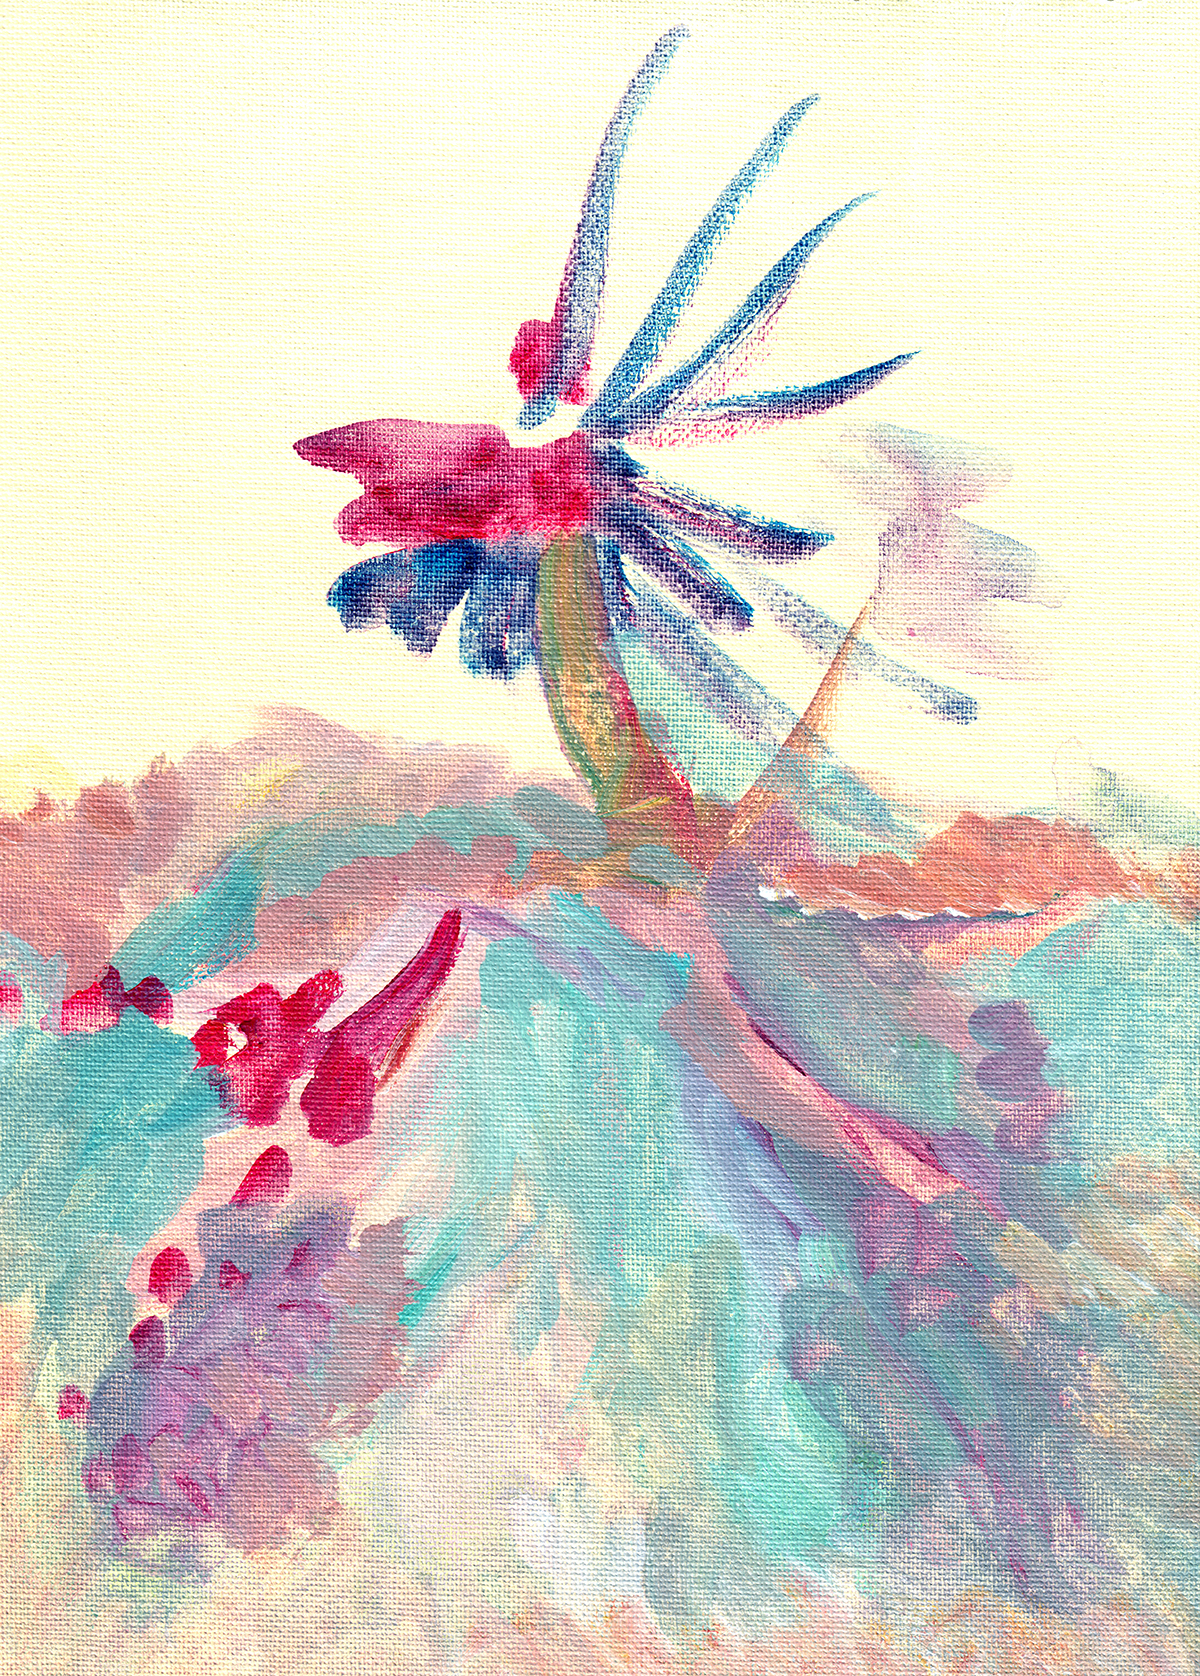 bali-painting-08-1200.jpg